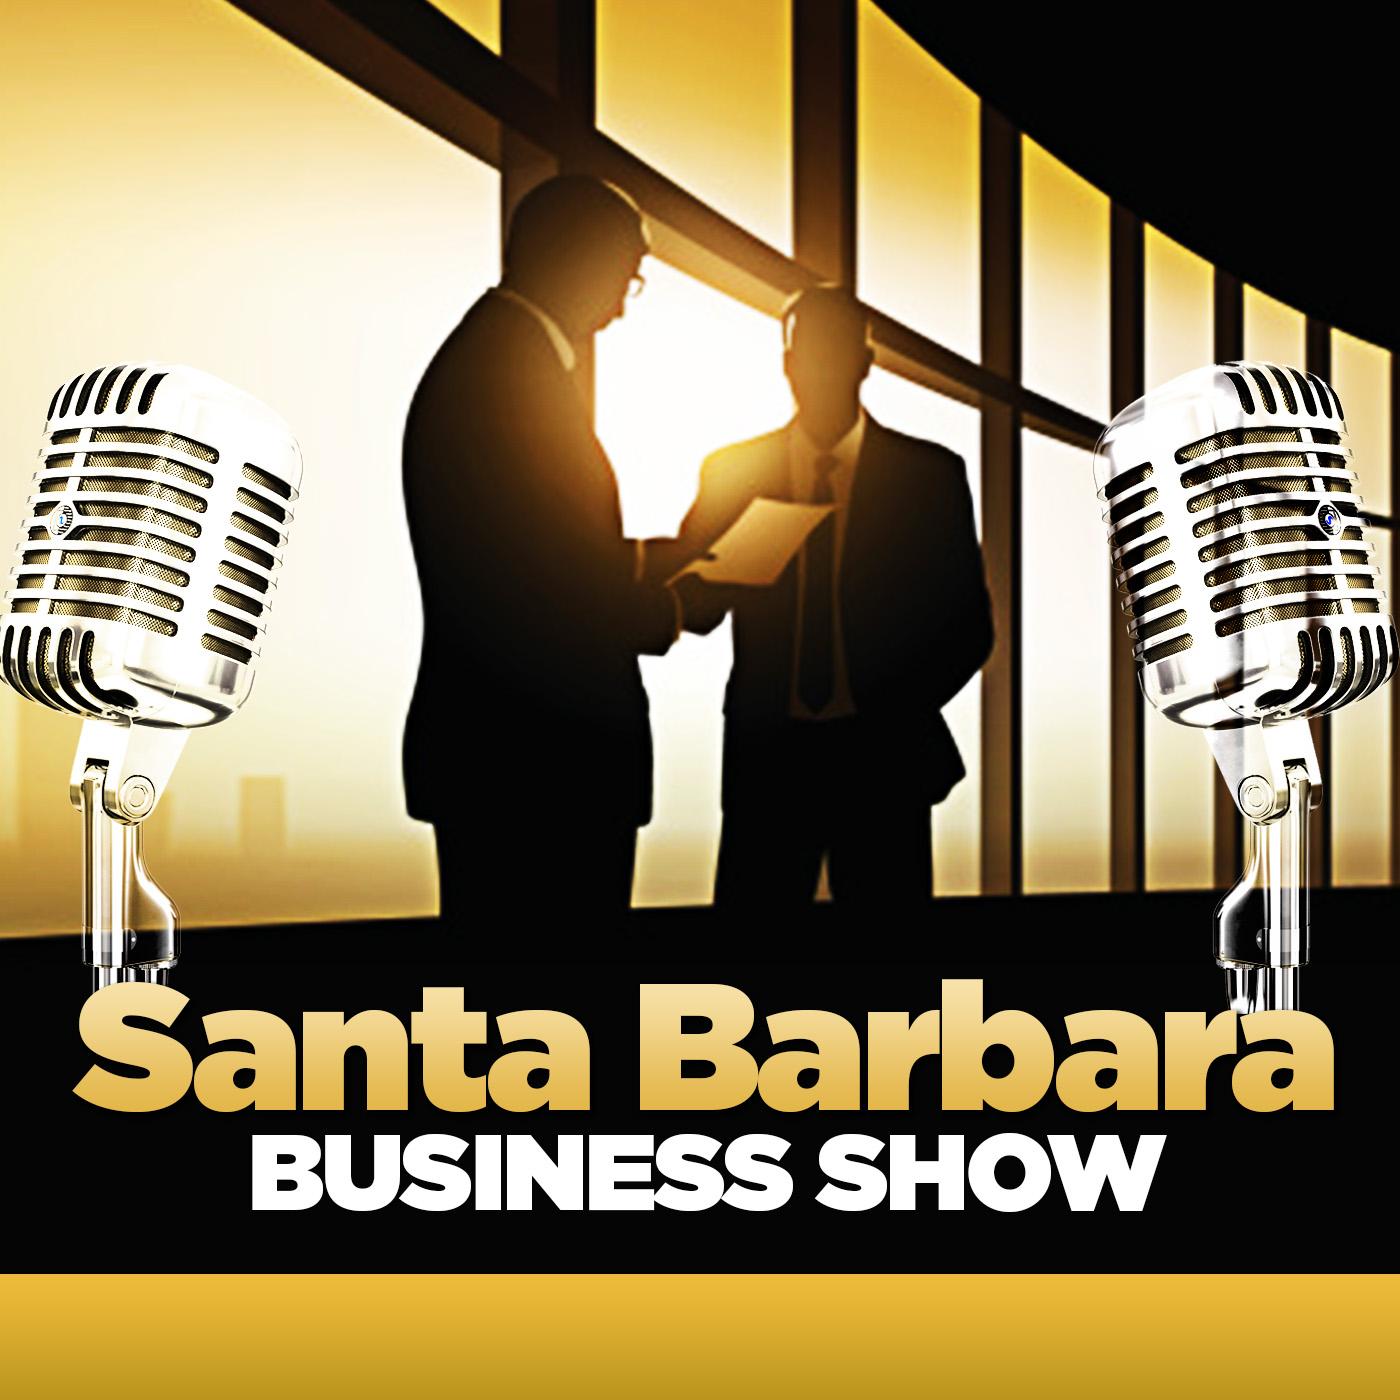 Santa Barbara Business Show